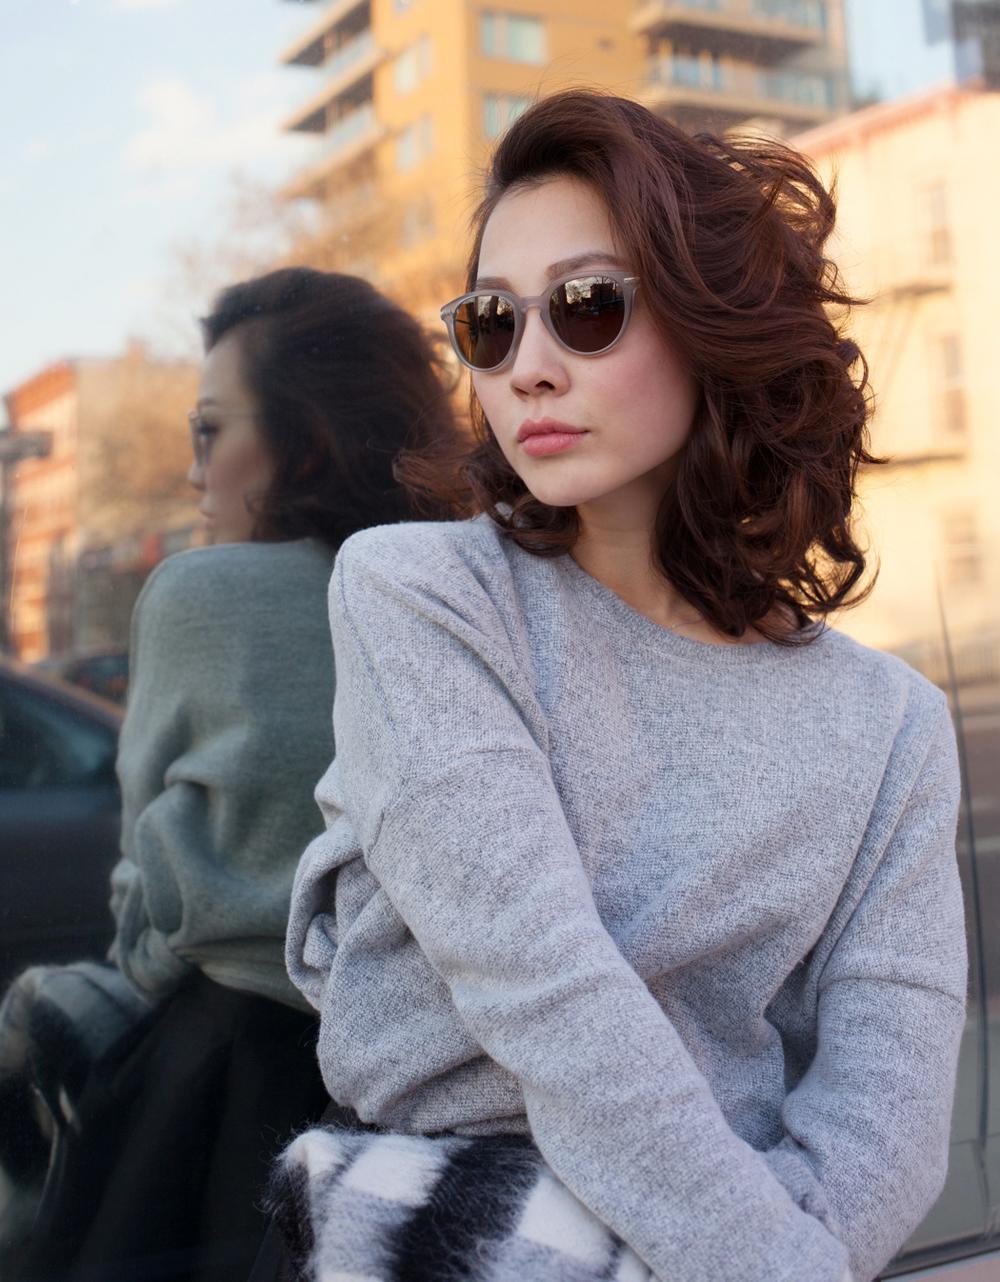 kaibosh sunglasses campaign.jpg